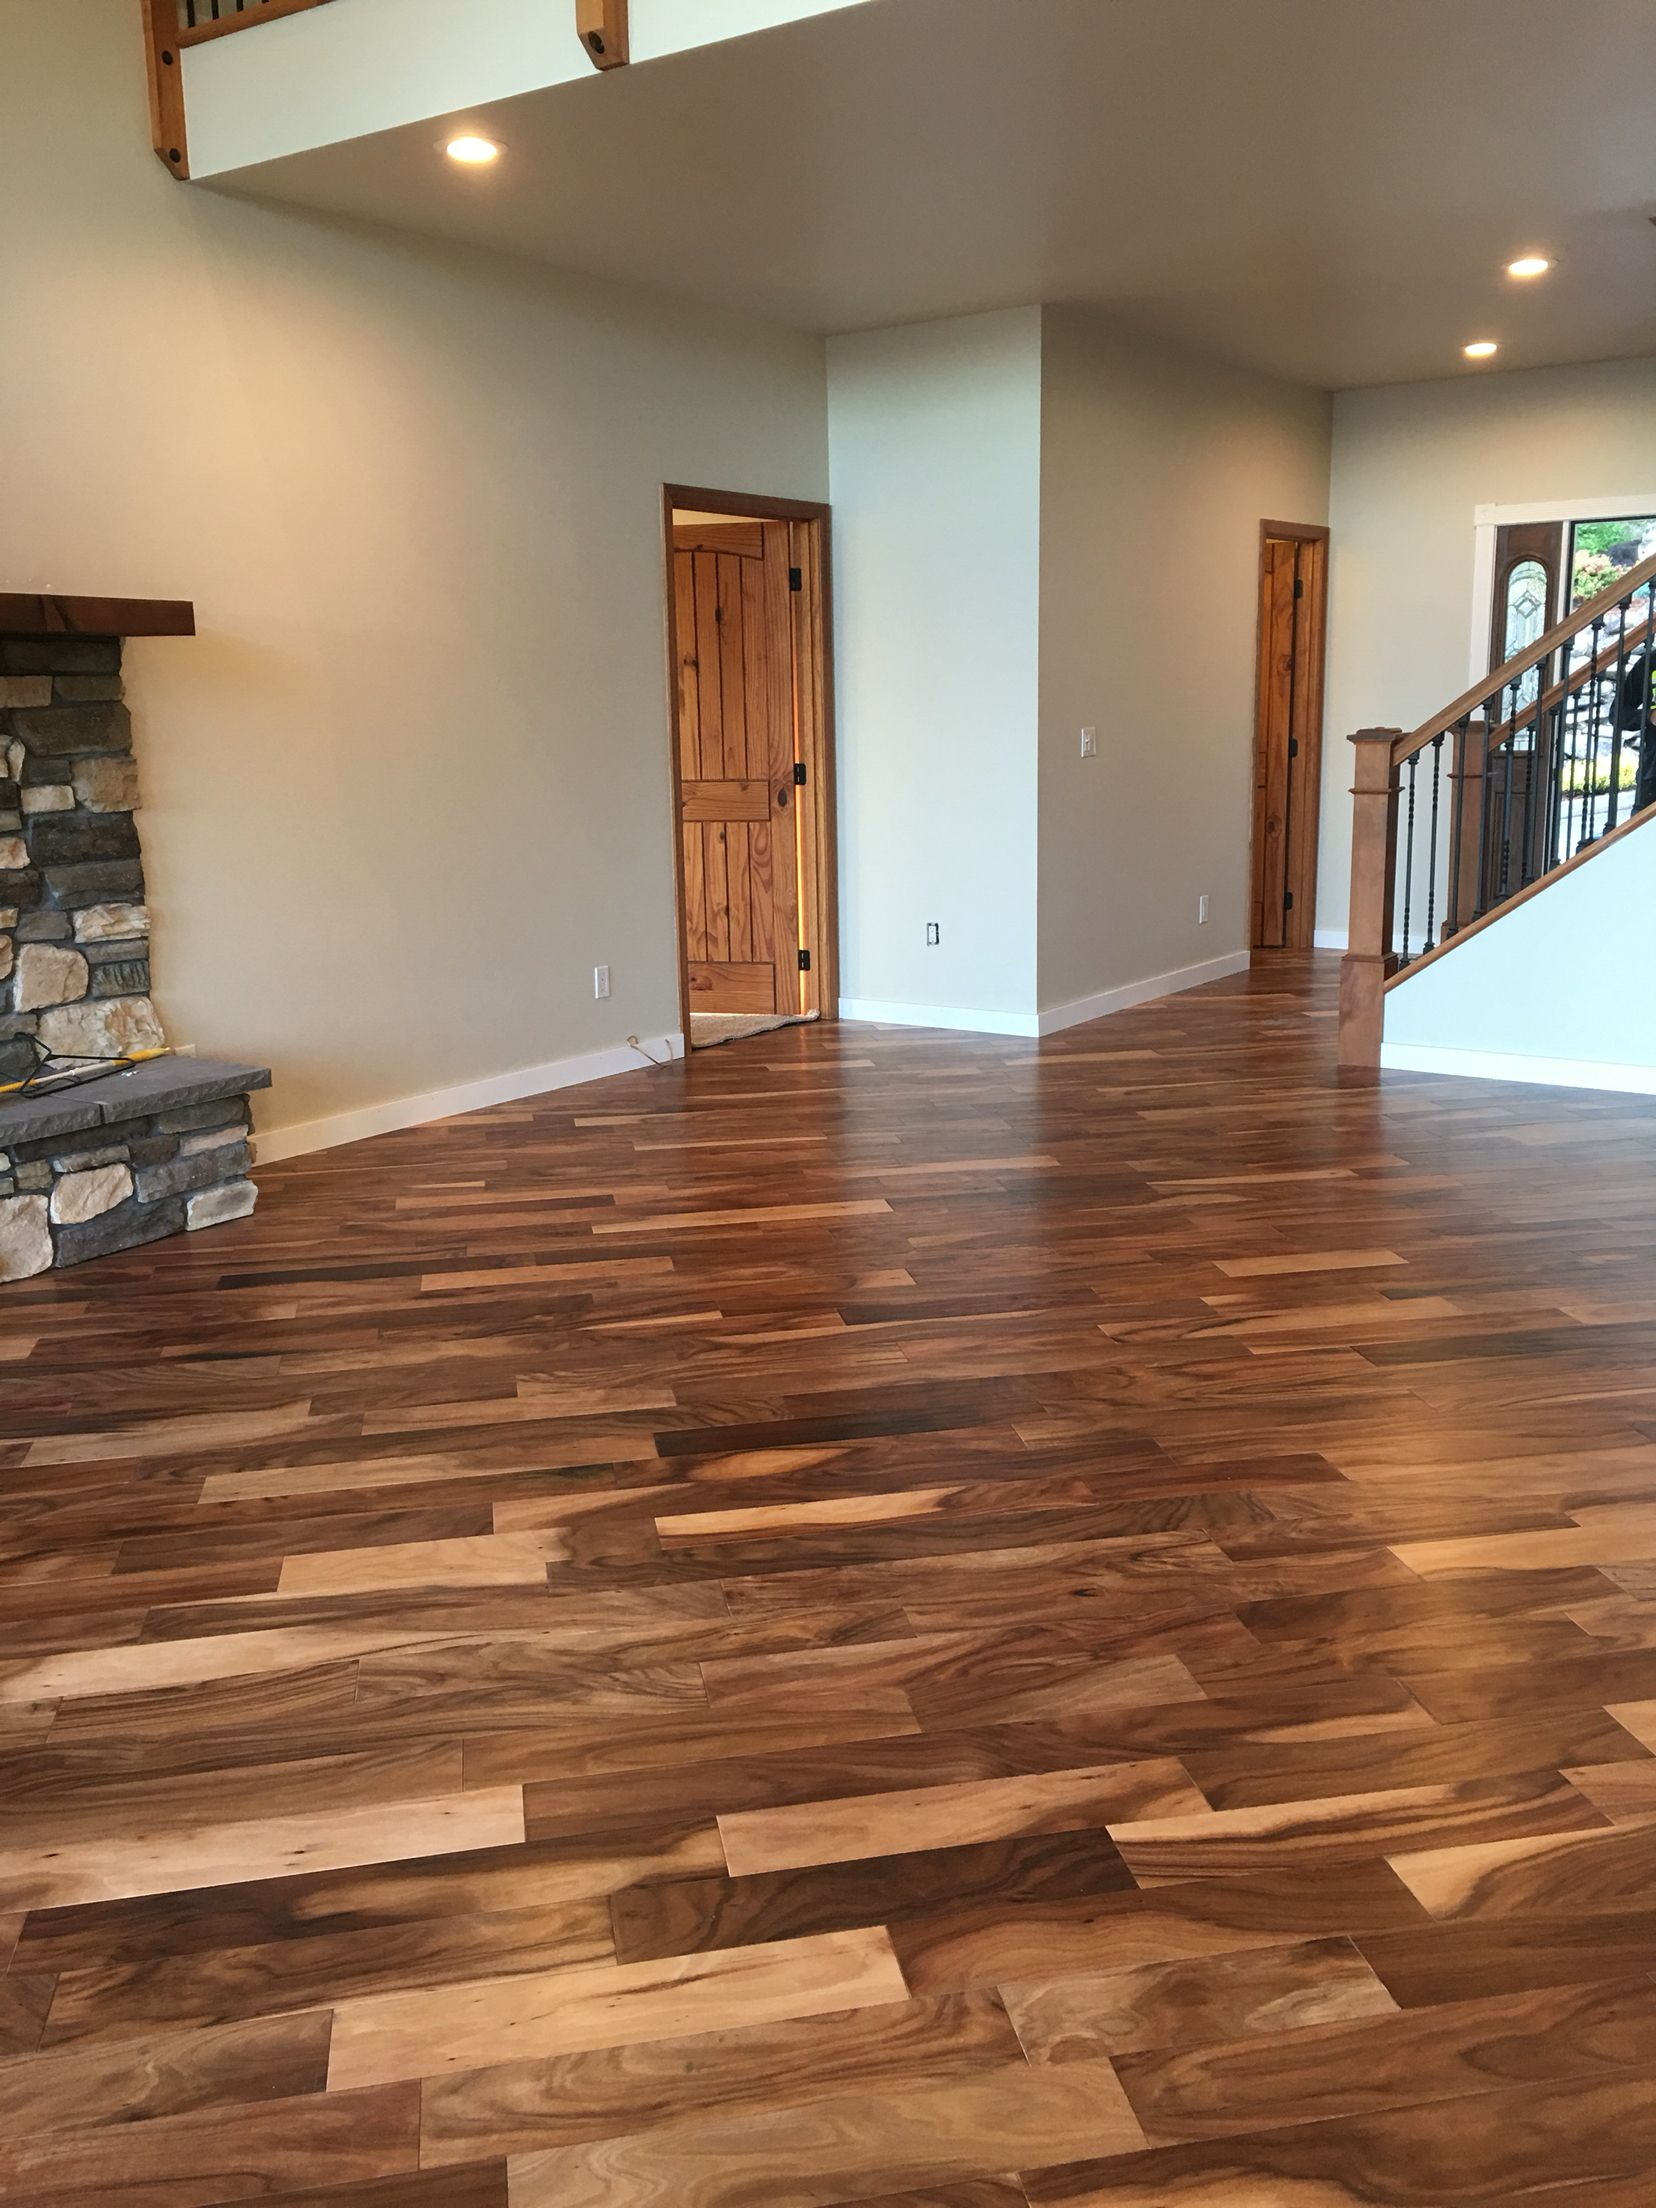 Hand scraped Acacia Home Depot engineered flooring in